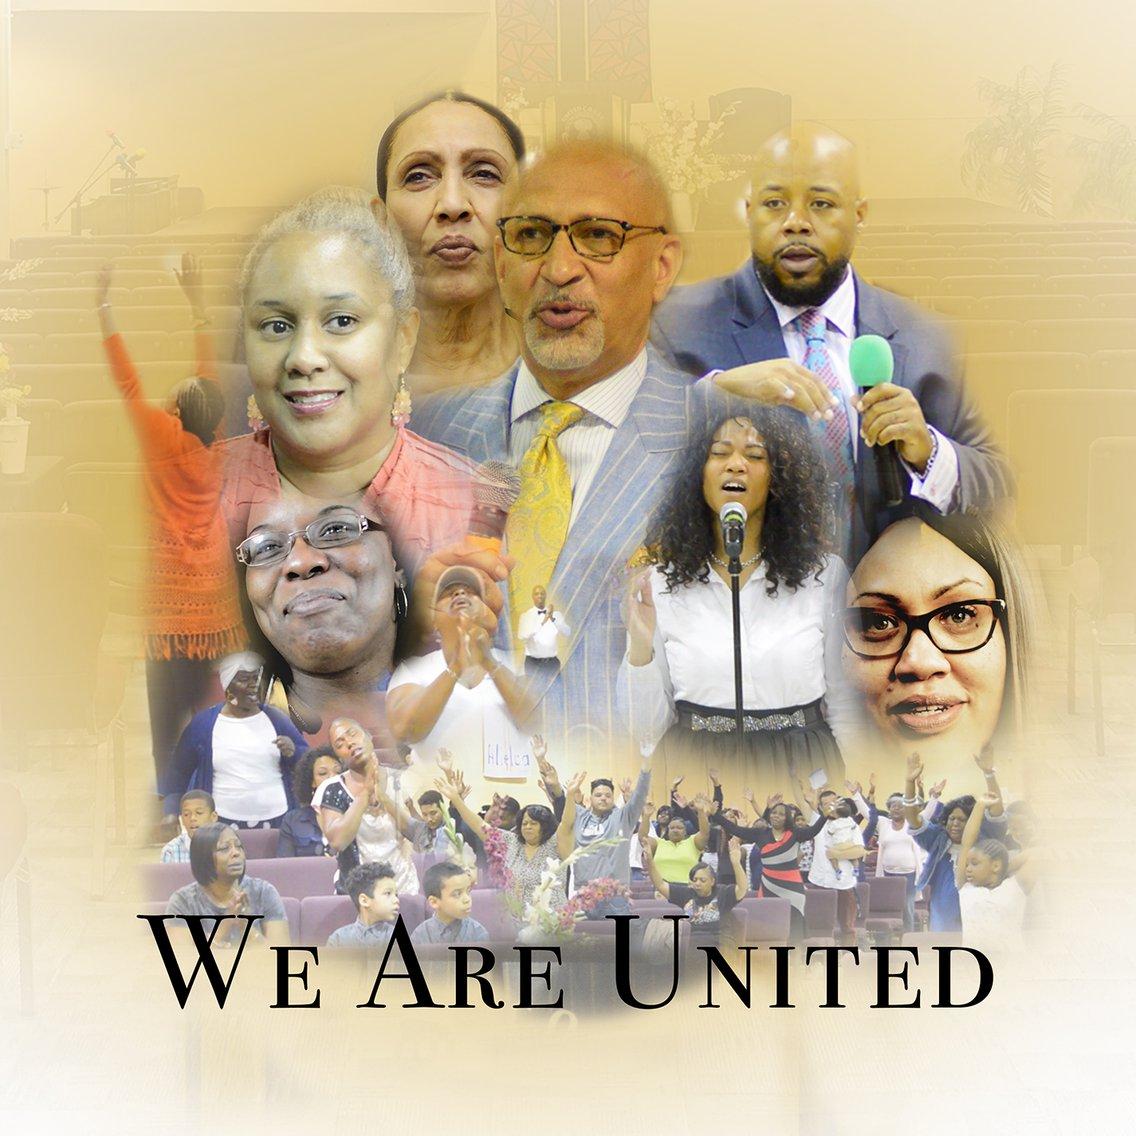 United Church Of God In Christ - imagen de portada